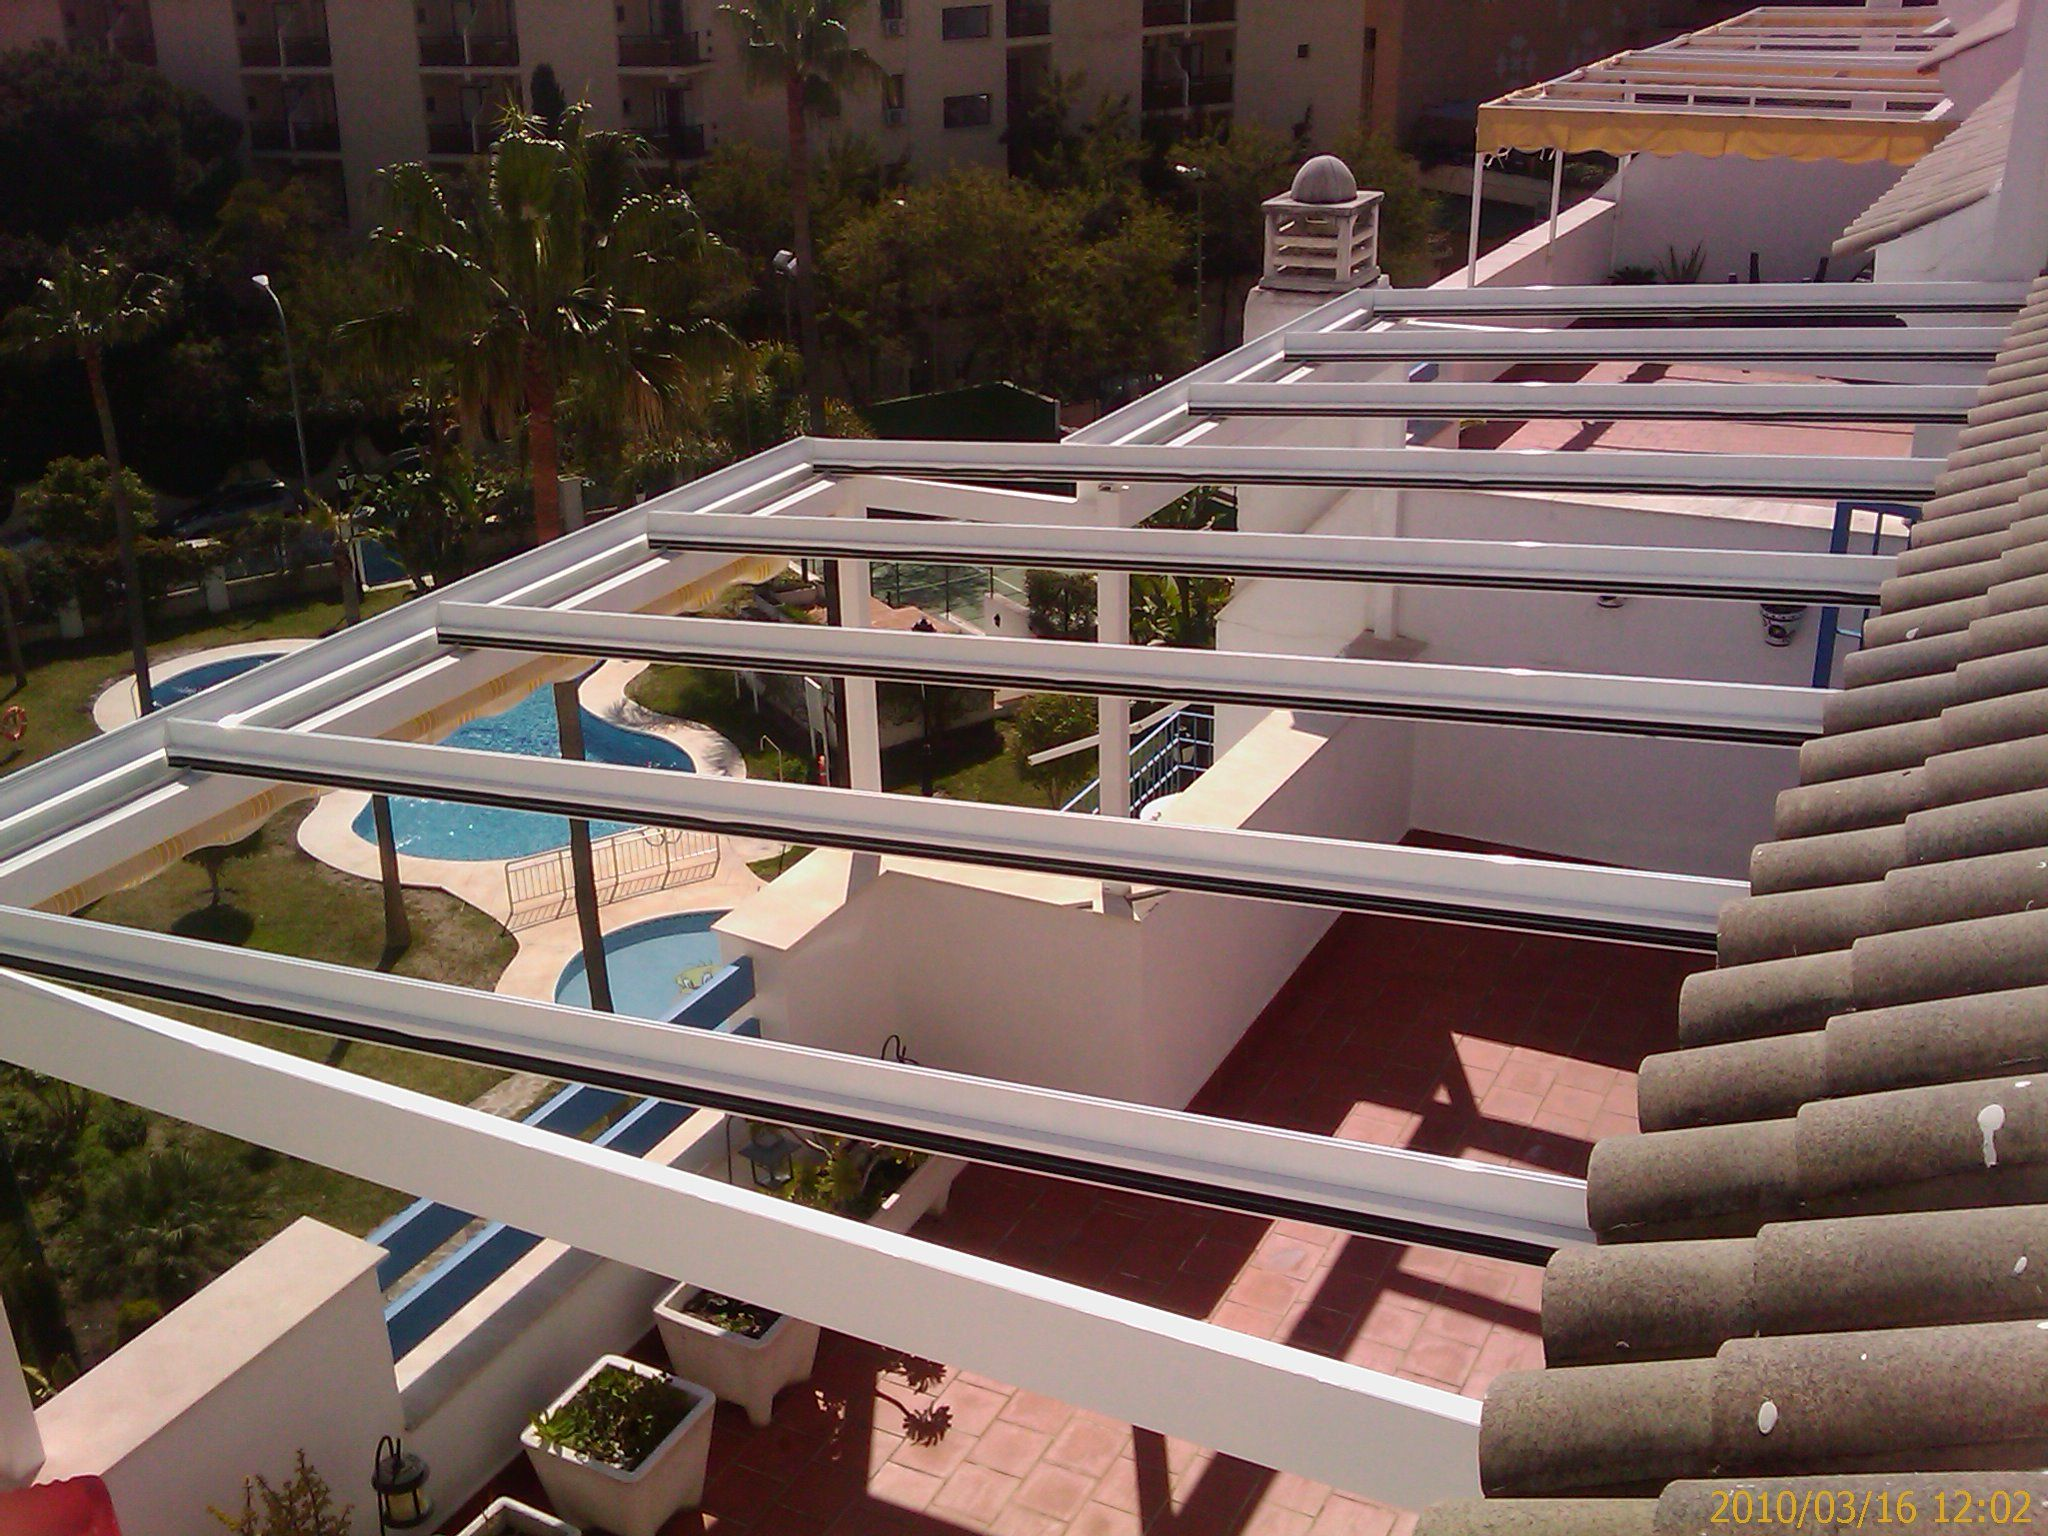 Foto 21 de Carpintería de aluminio, metálica y PVC en Málaga | Aluminios Alunoe